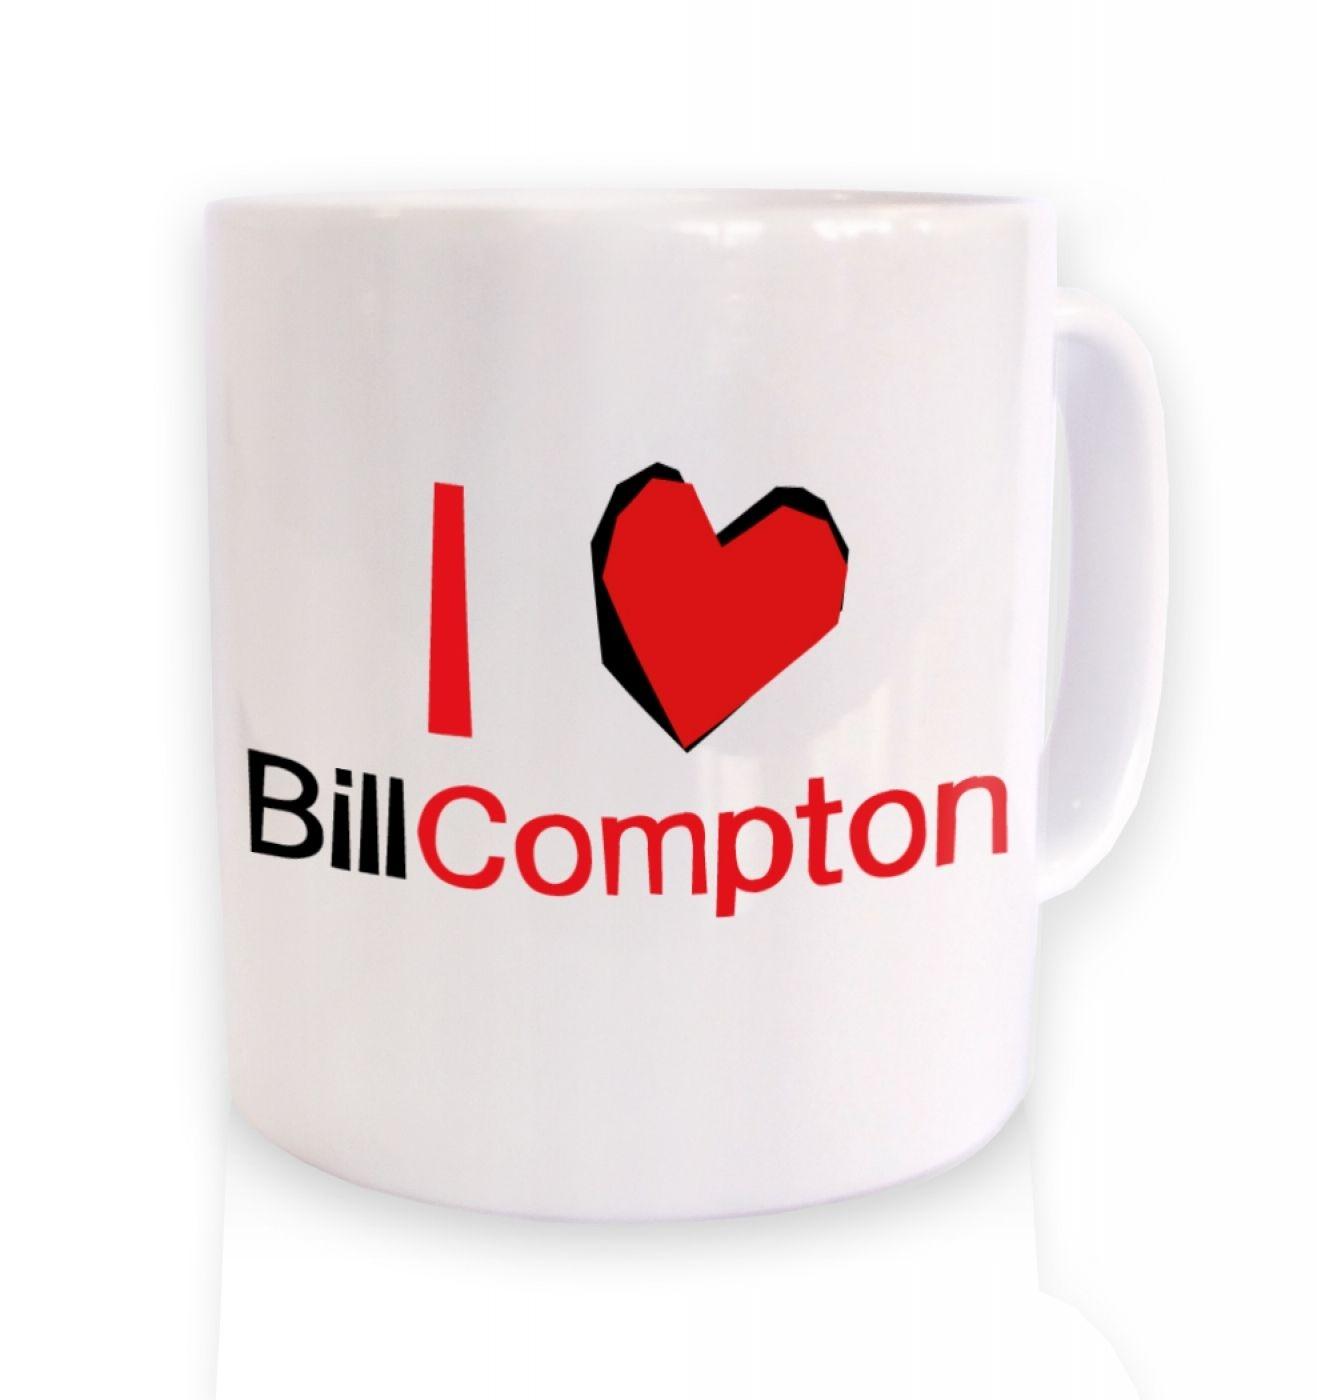 I heart Bill Compton mug - Inspired by True Blood